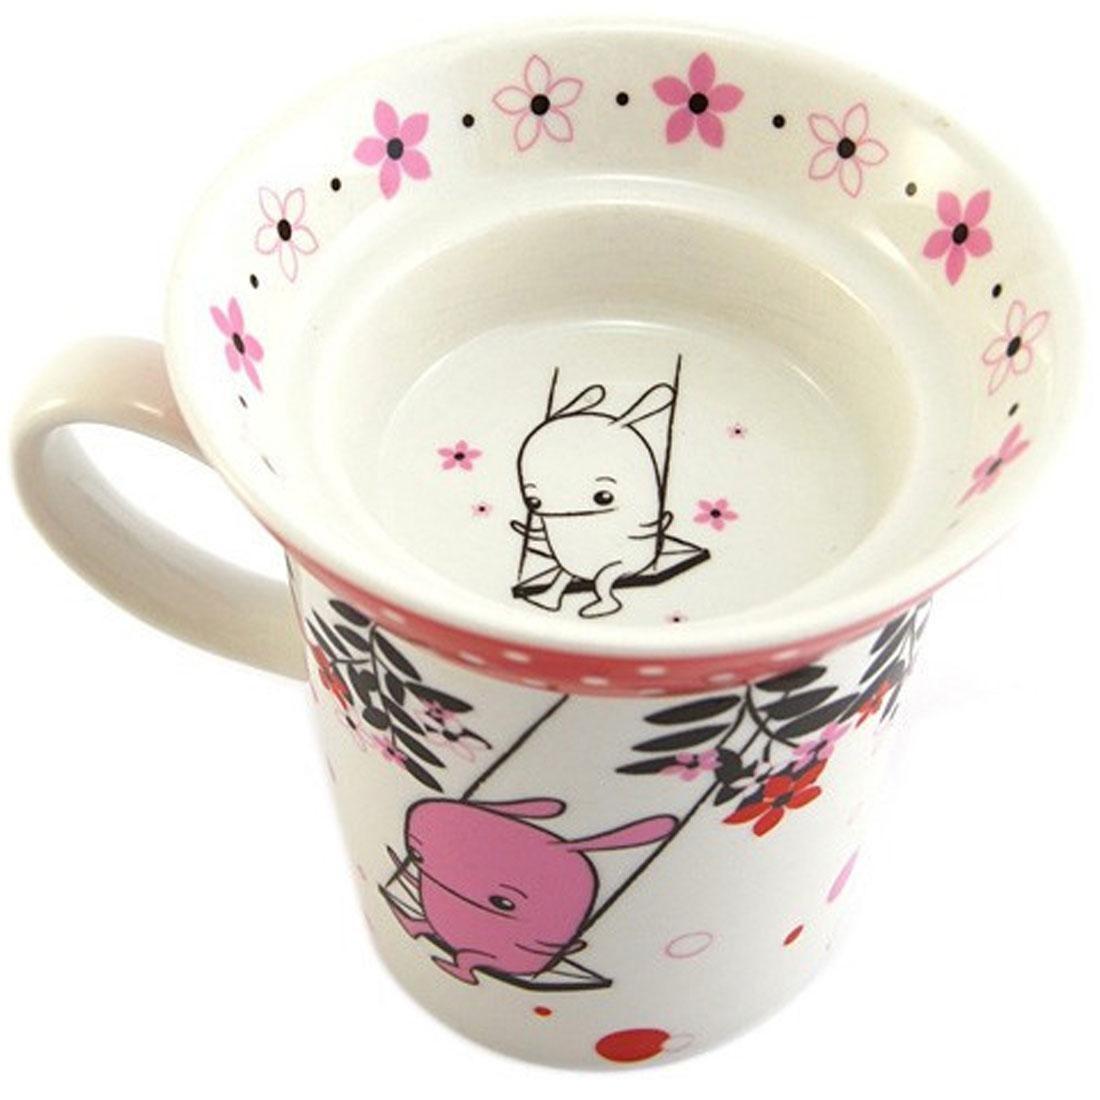 Pecanpals Cup Set (red / pink)